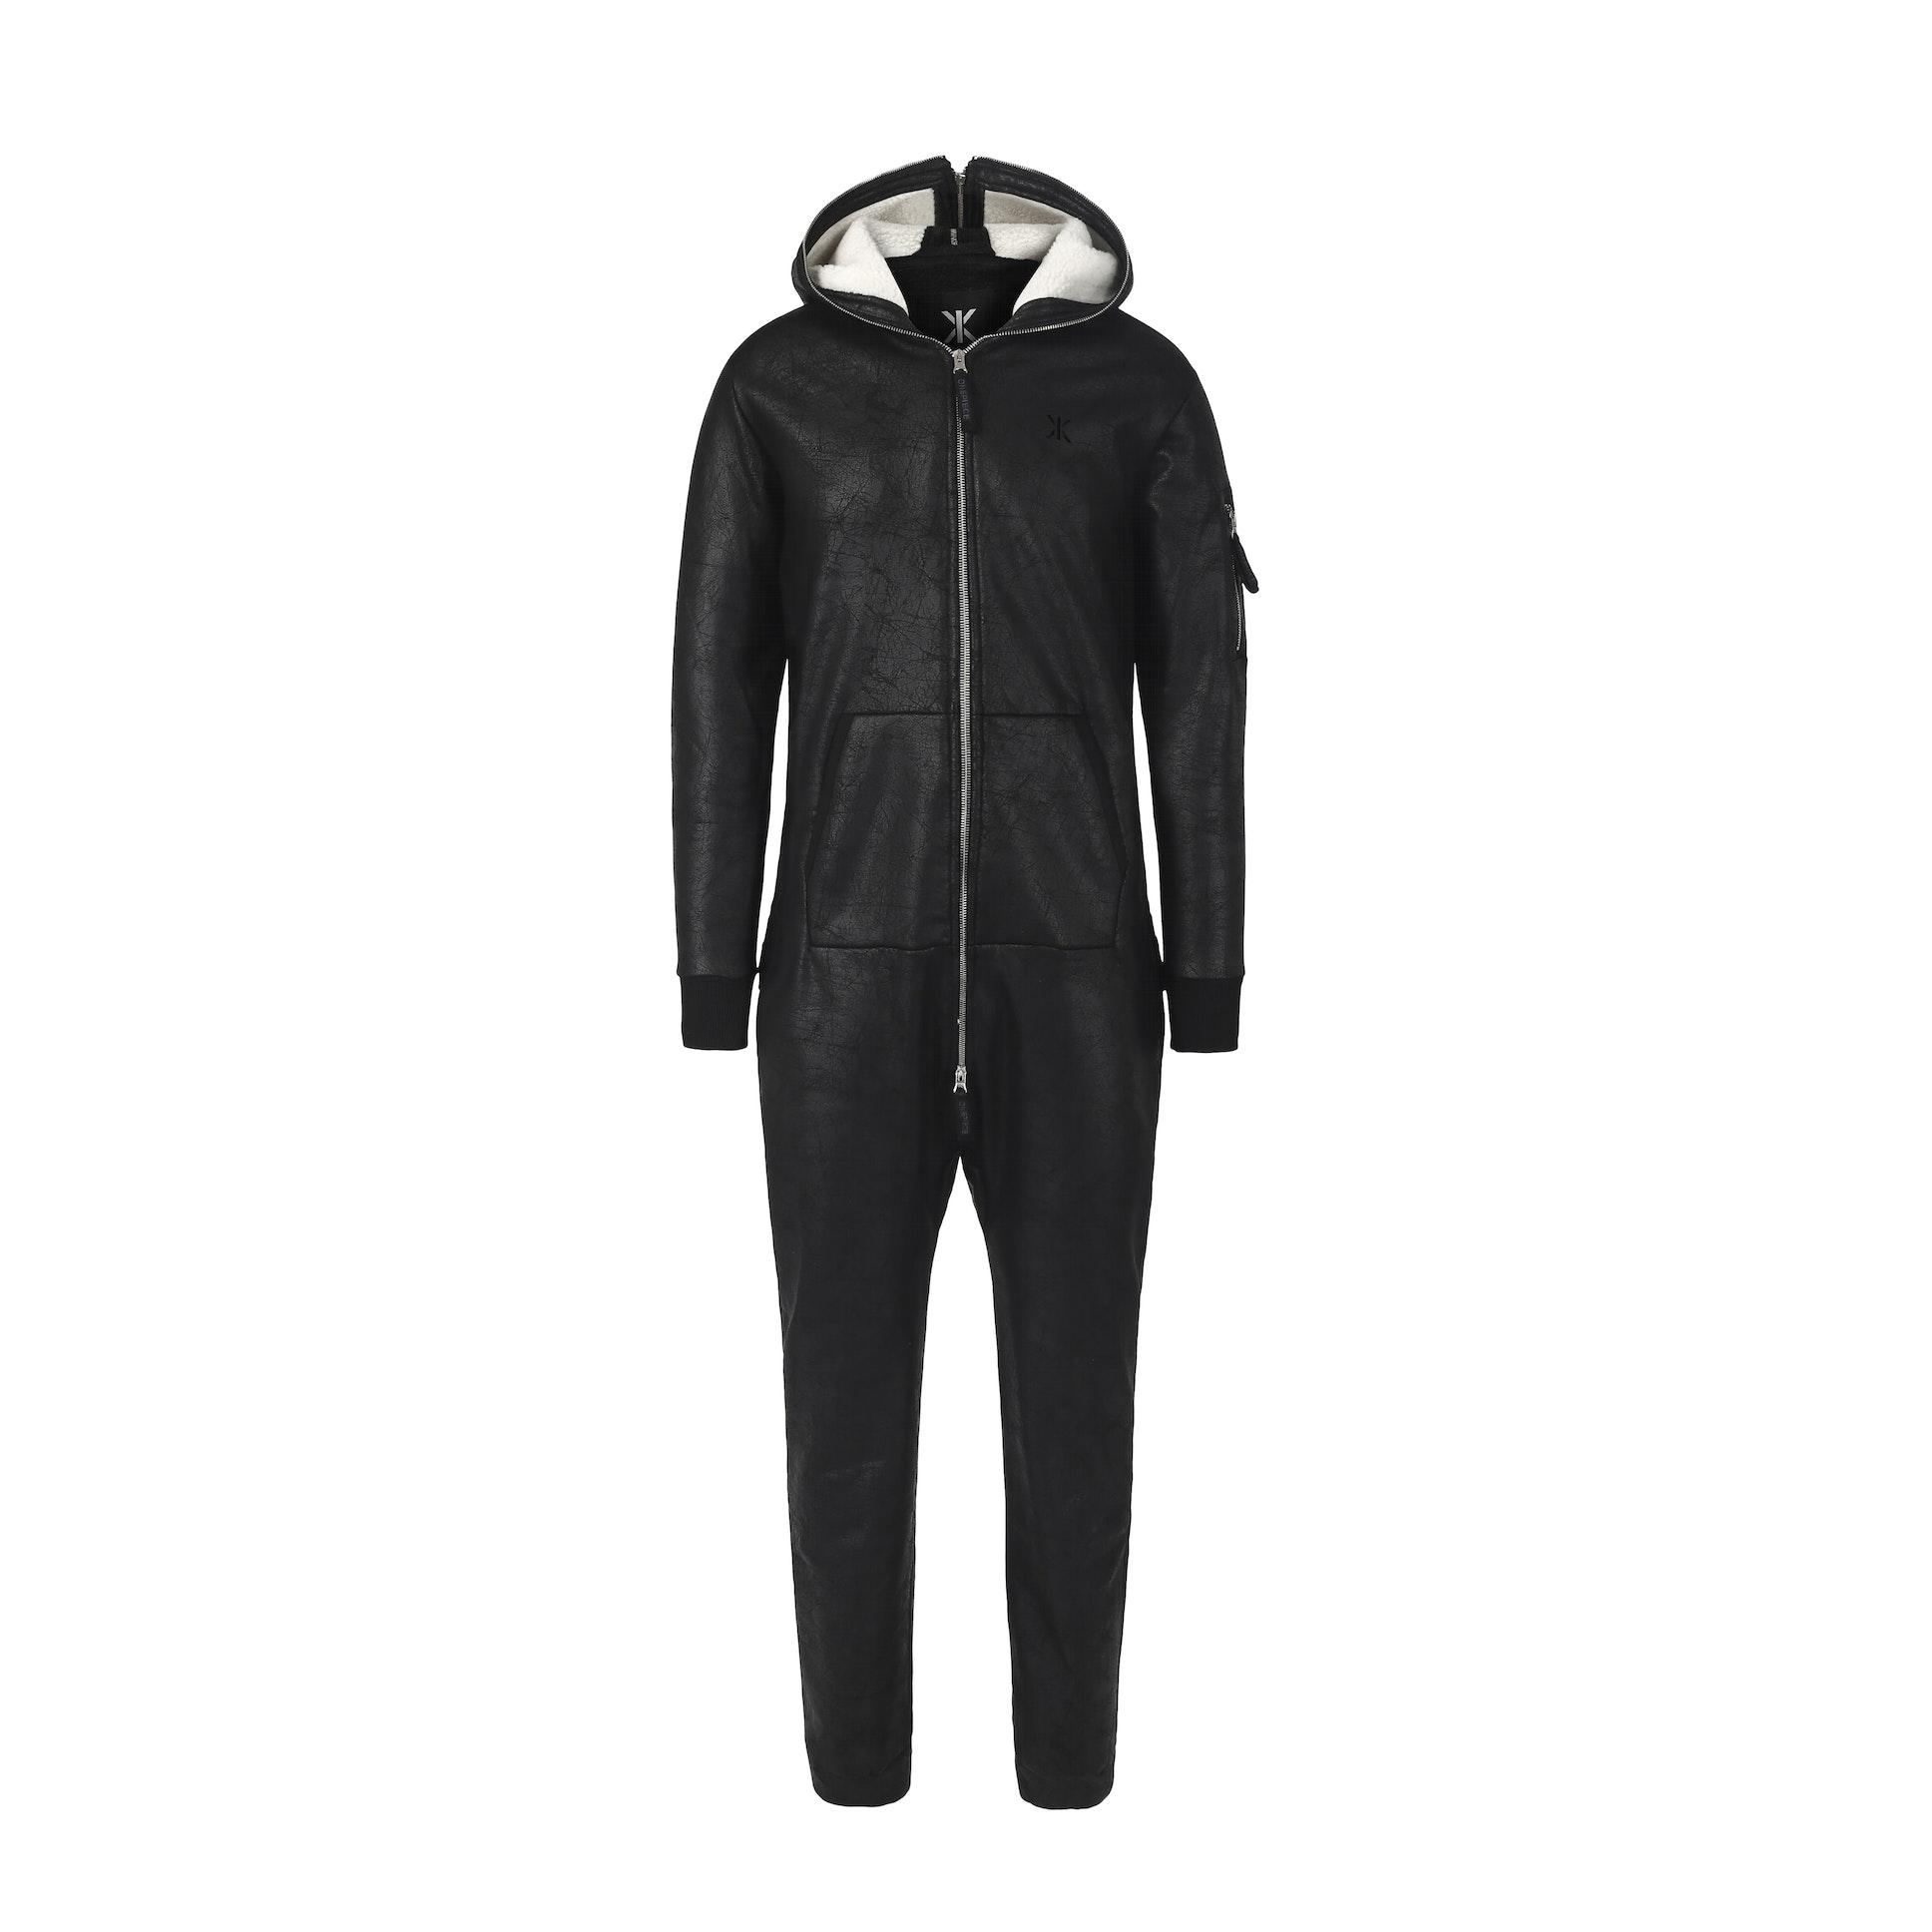 soft bomber jumpsuit black